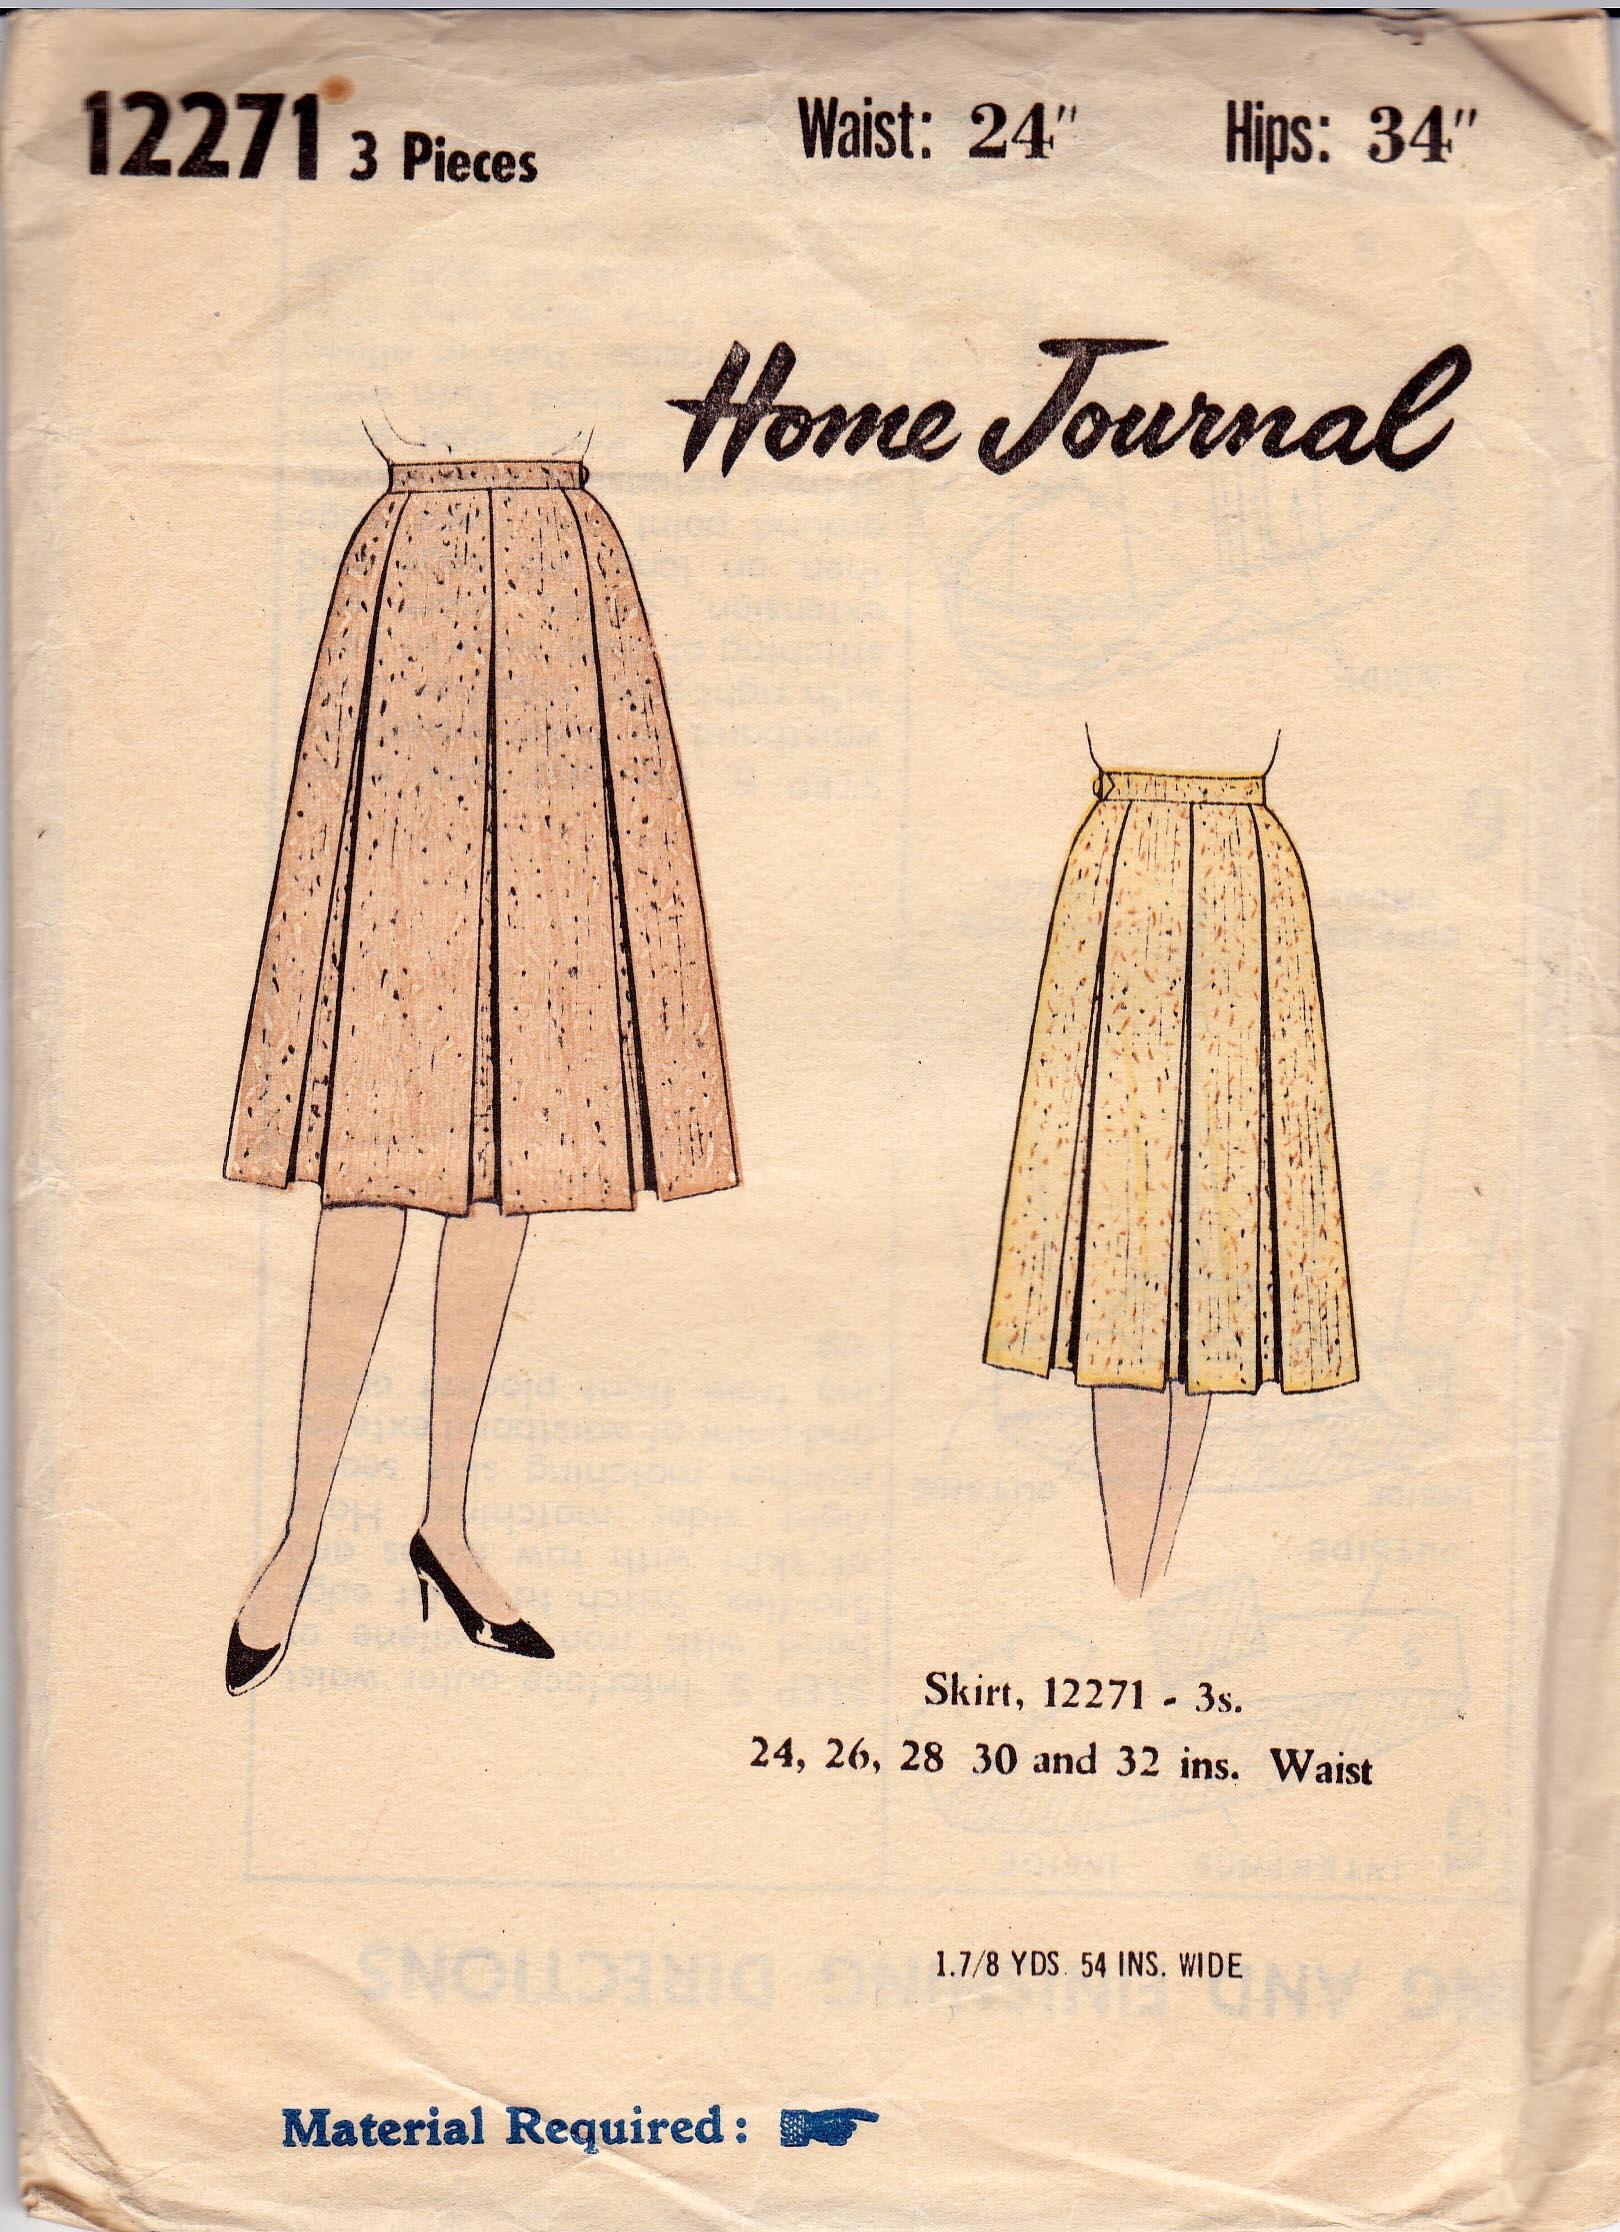 Australian Home Journal 12271